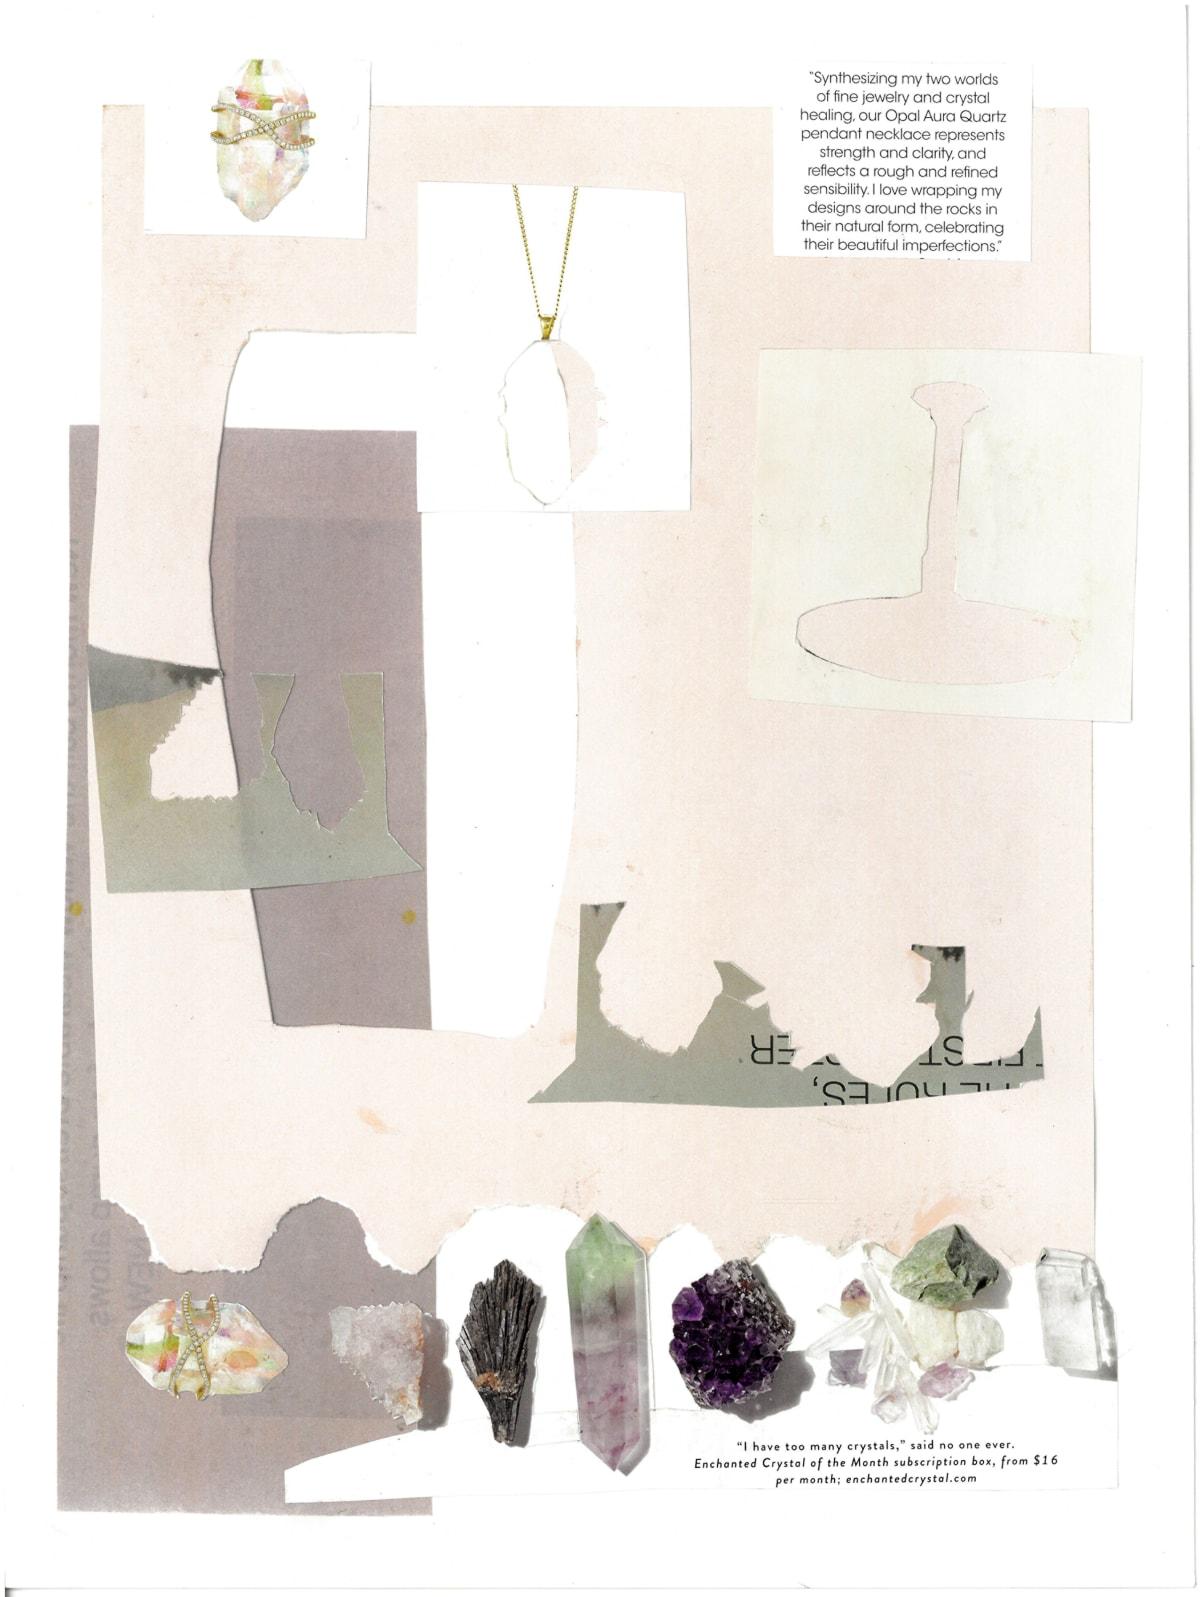 Ilana Harris-Babou, Crystals, 2020